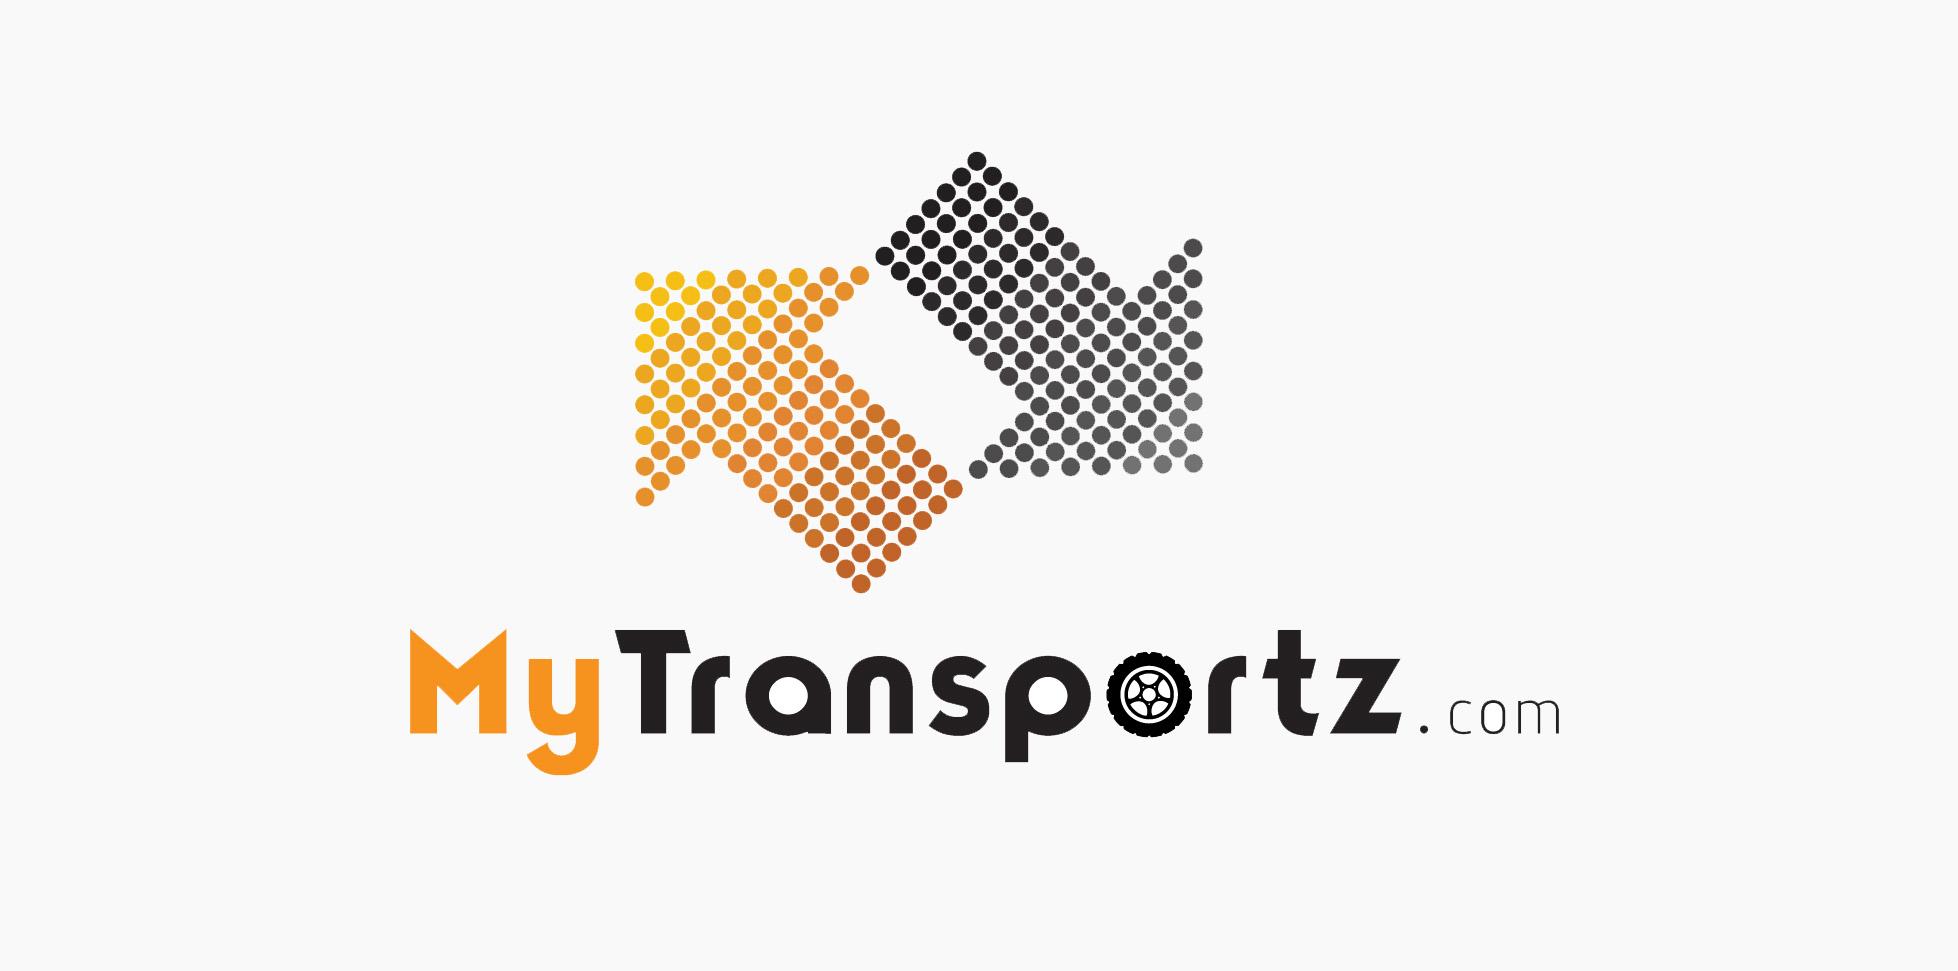 MyTransportz.com